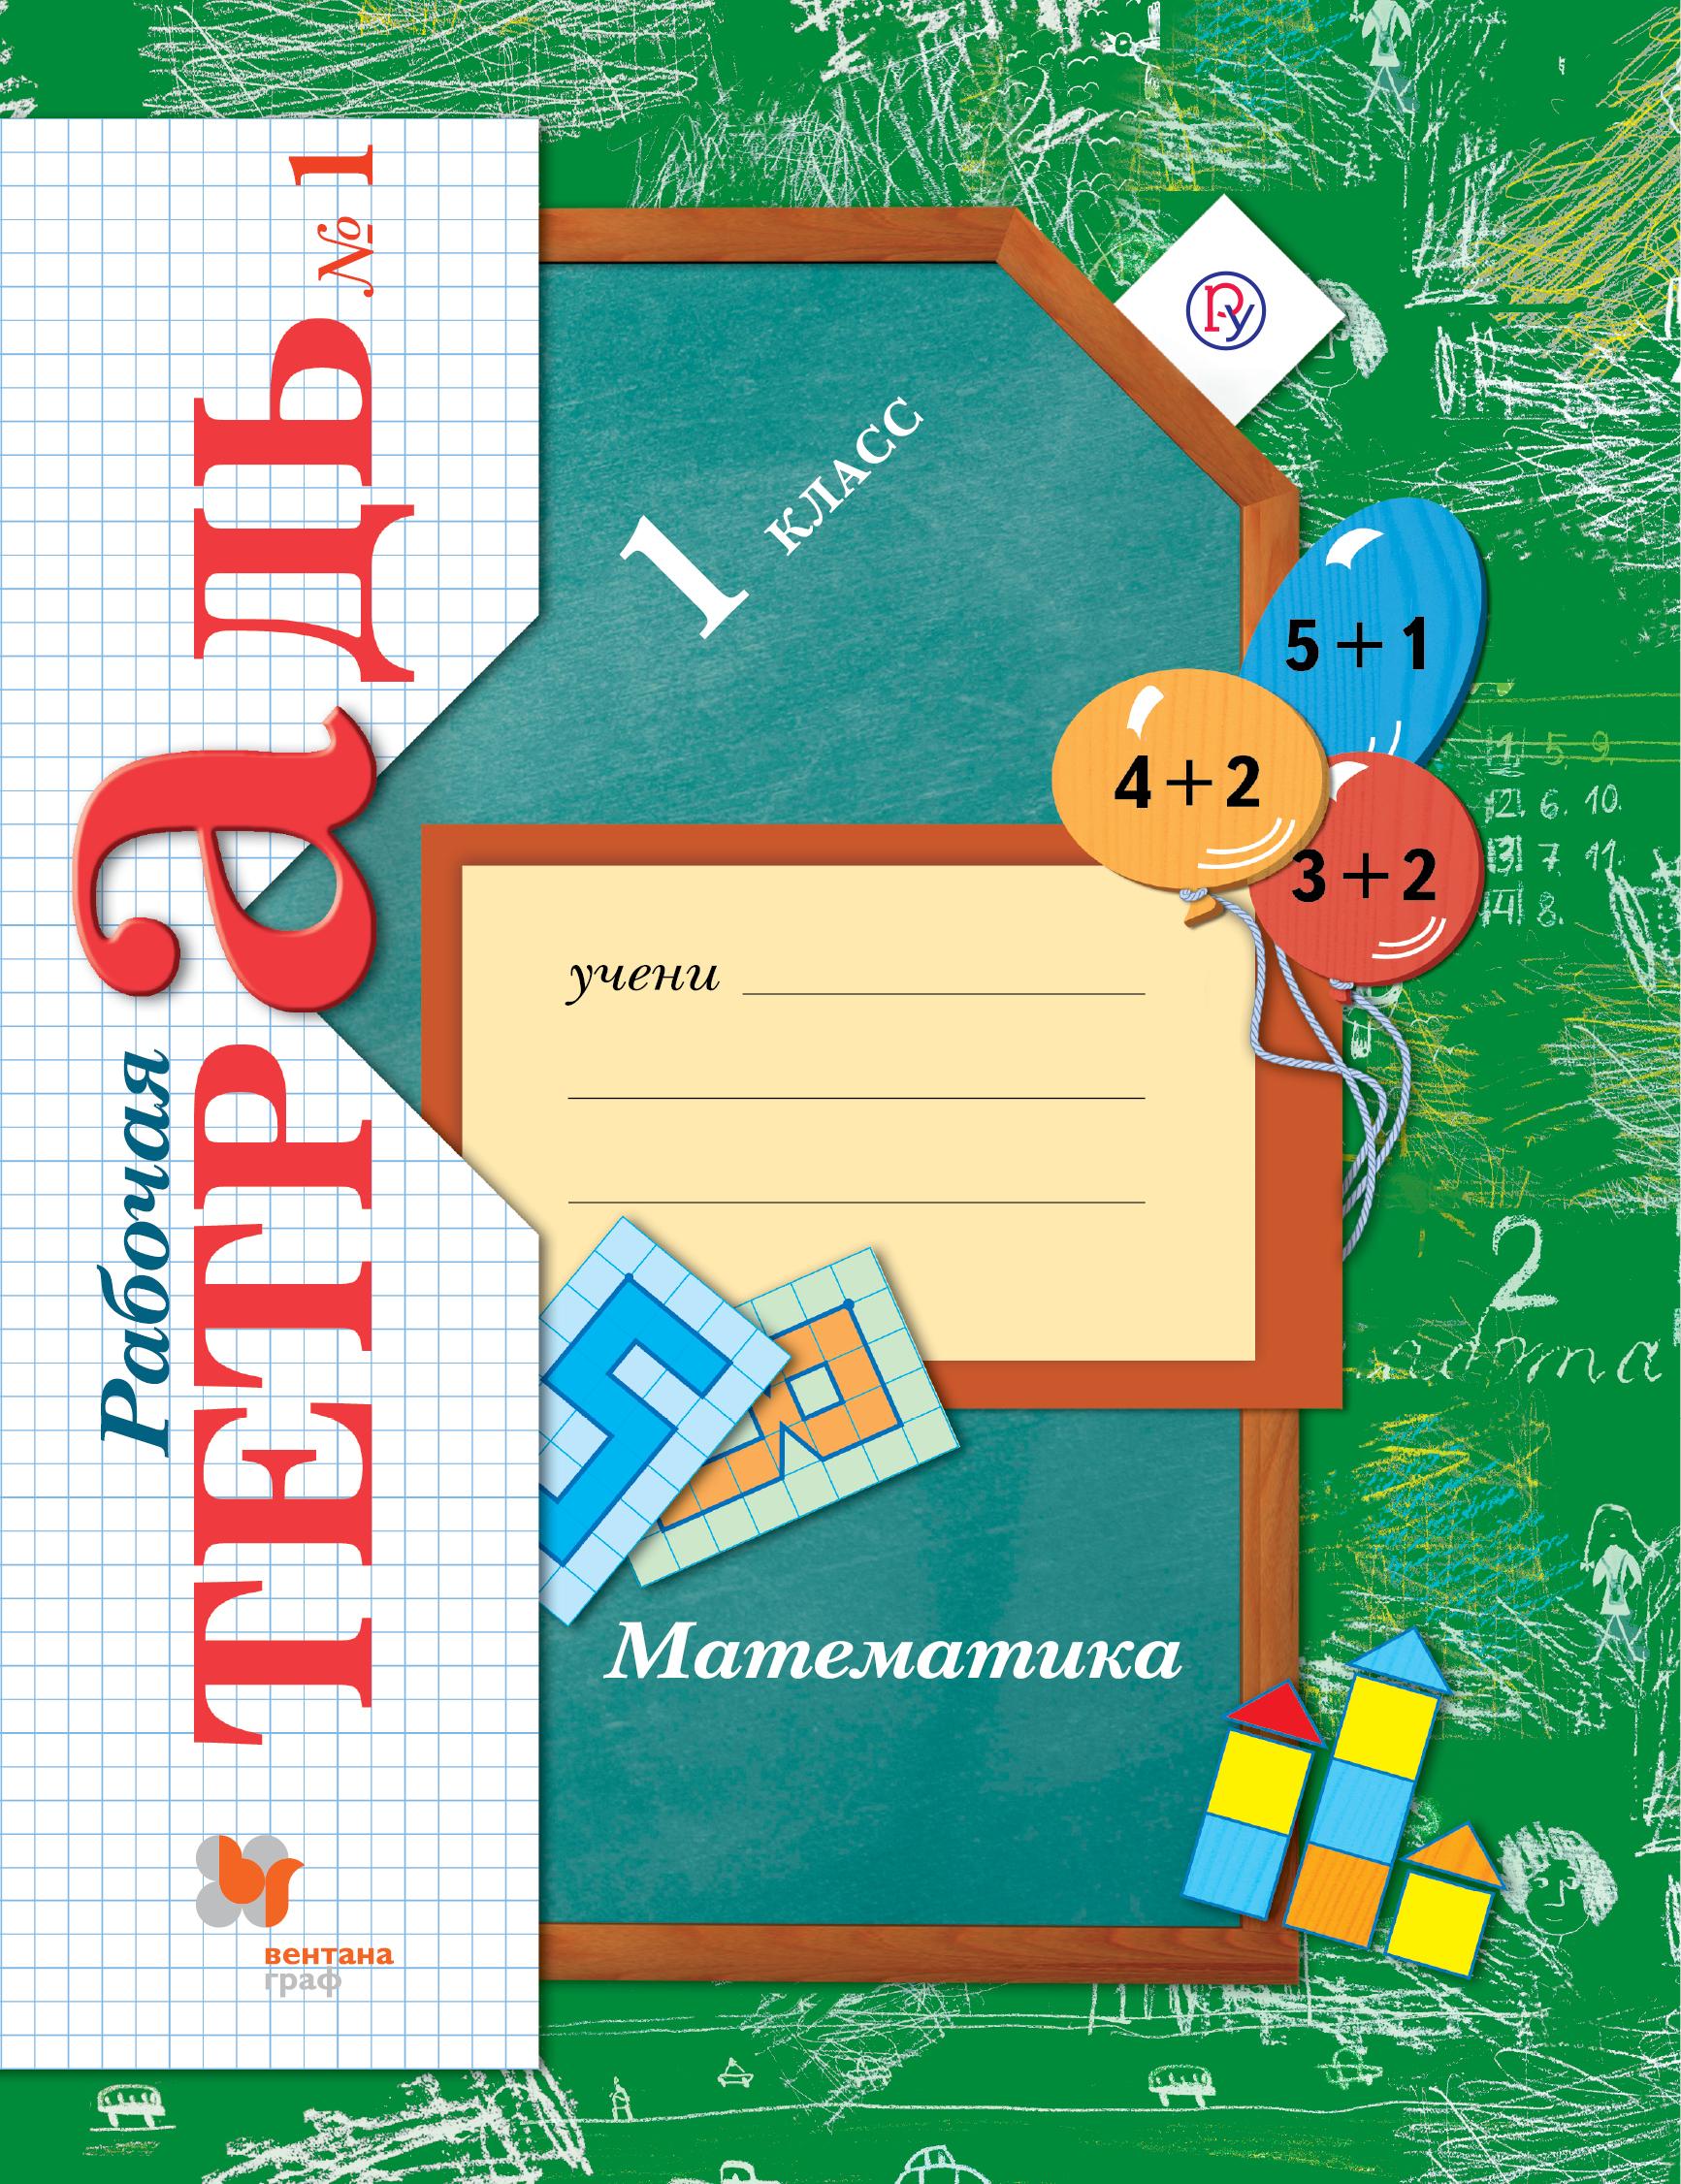 Кочурова Е.Э. Математика. 1 класс. Рабочая тетрадь № 1 математика 6 класс рабочая тетрадь